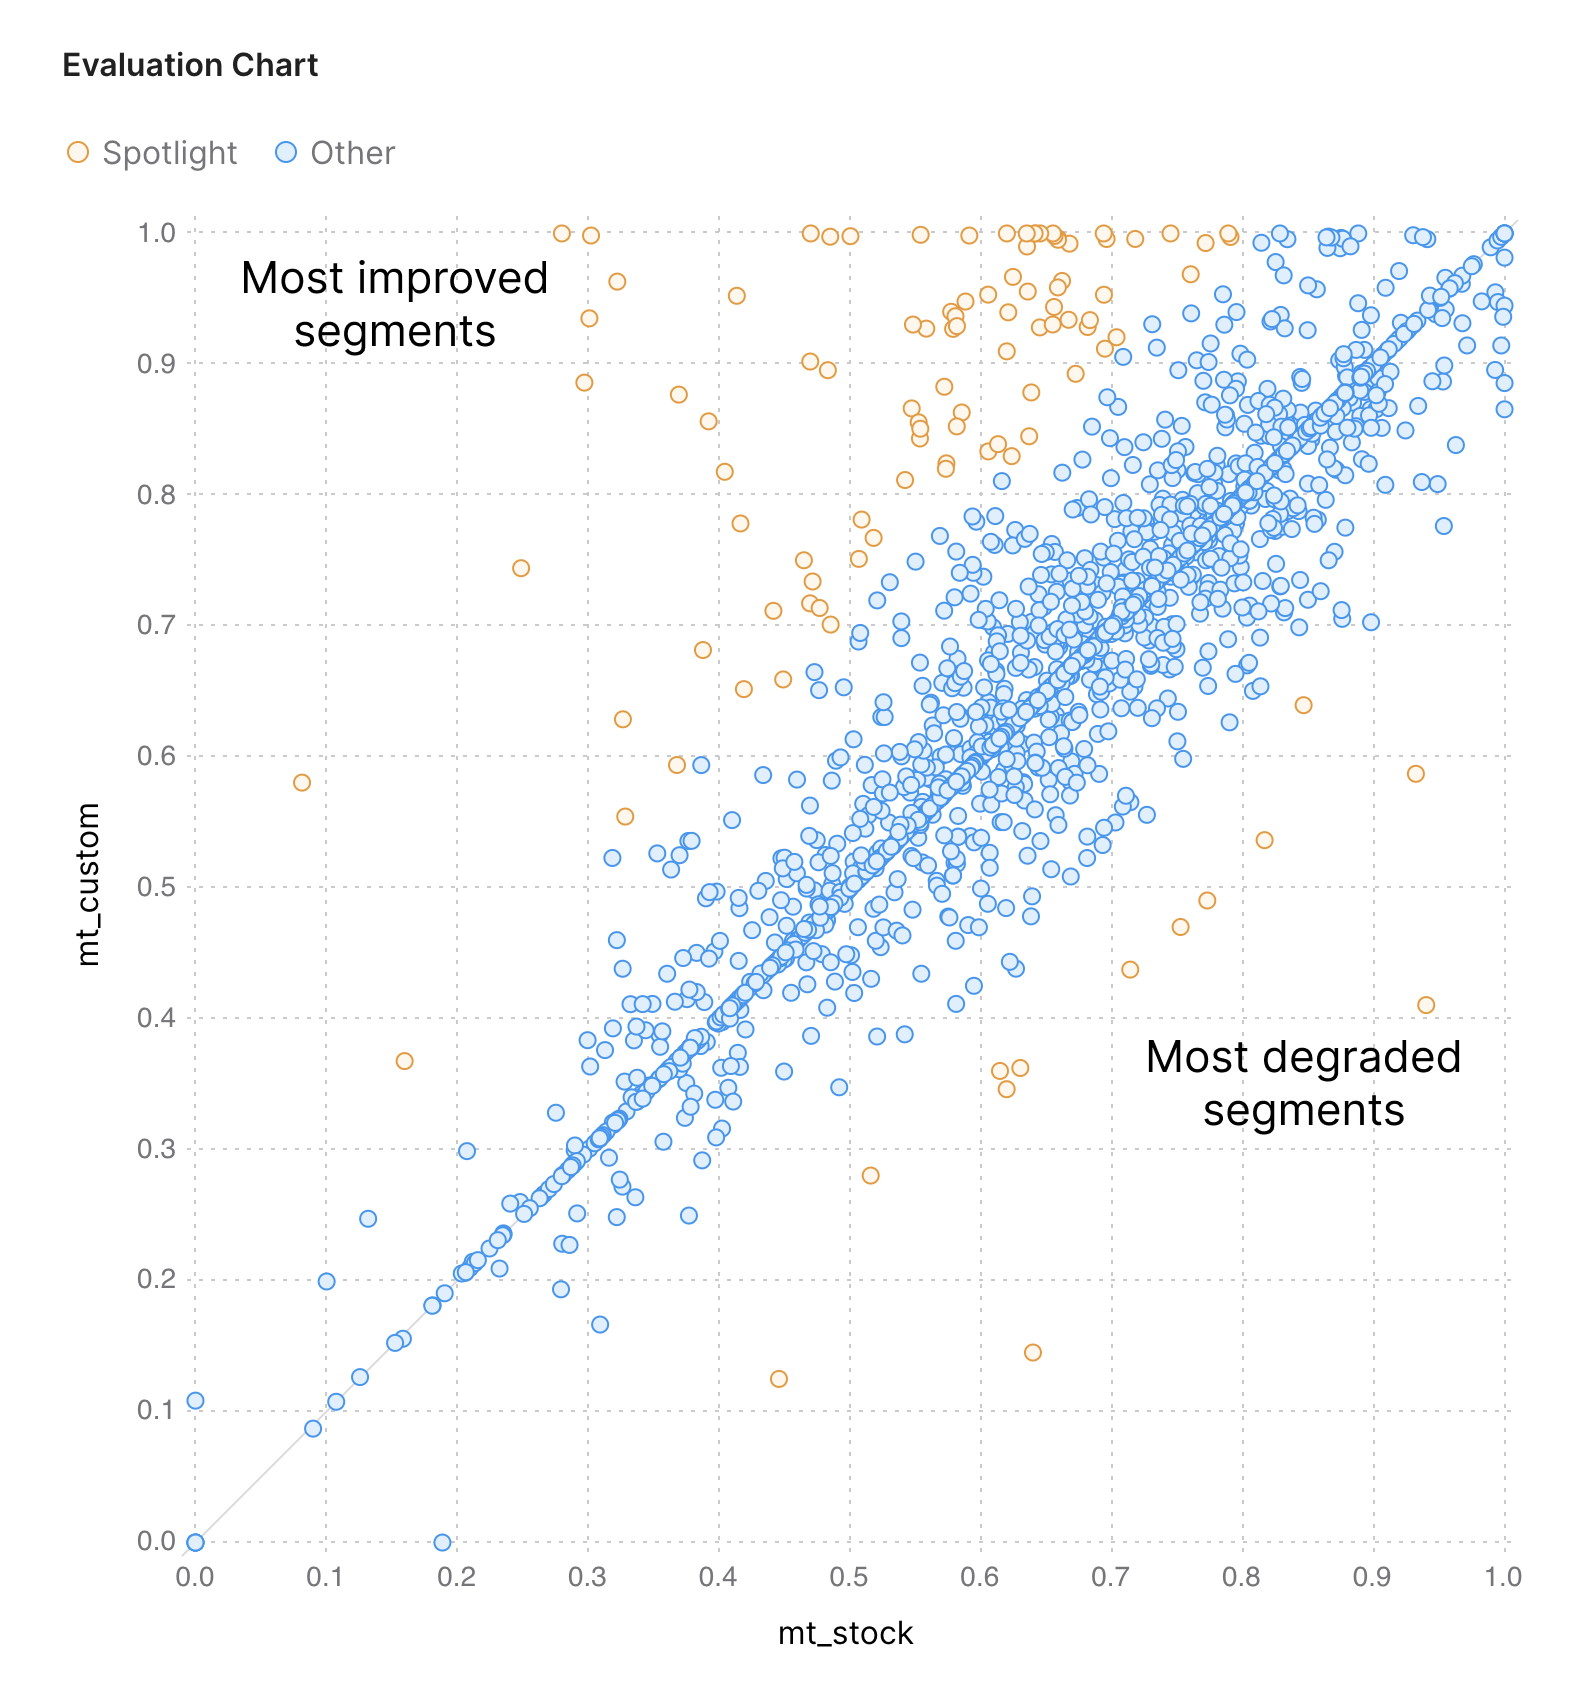 Spotlight Evaluation chart